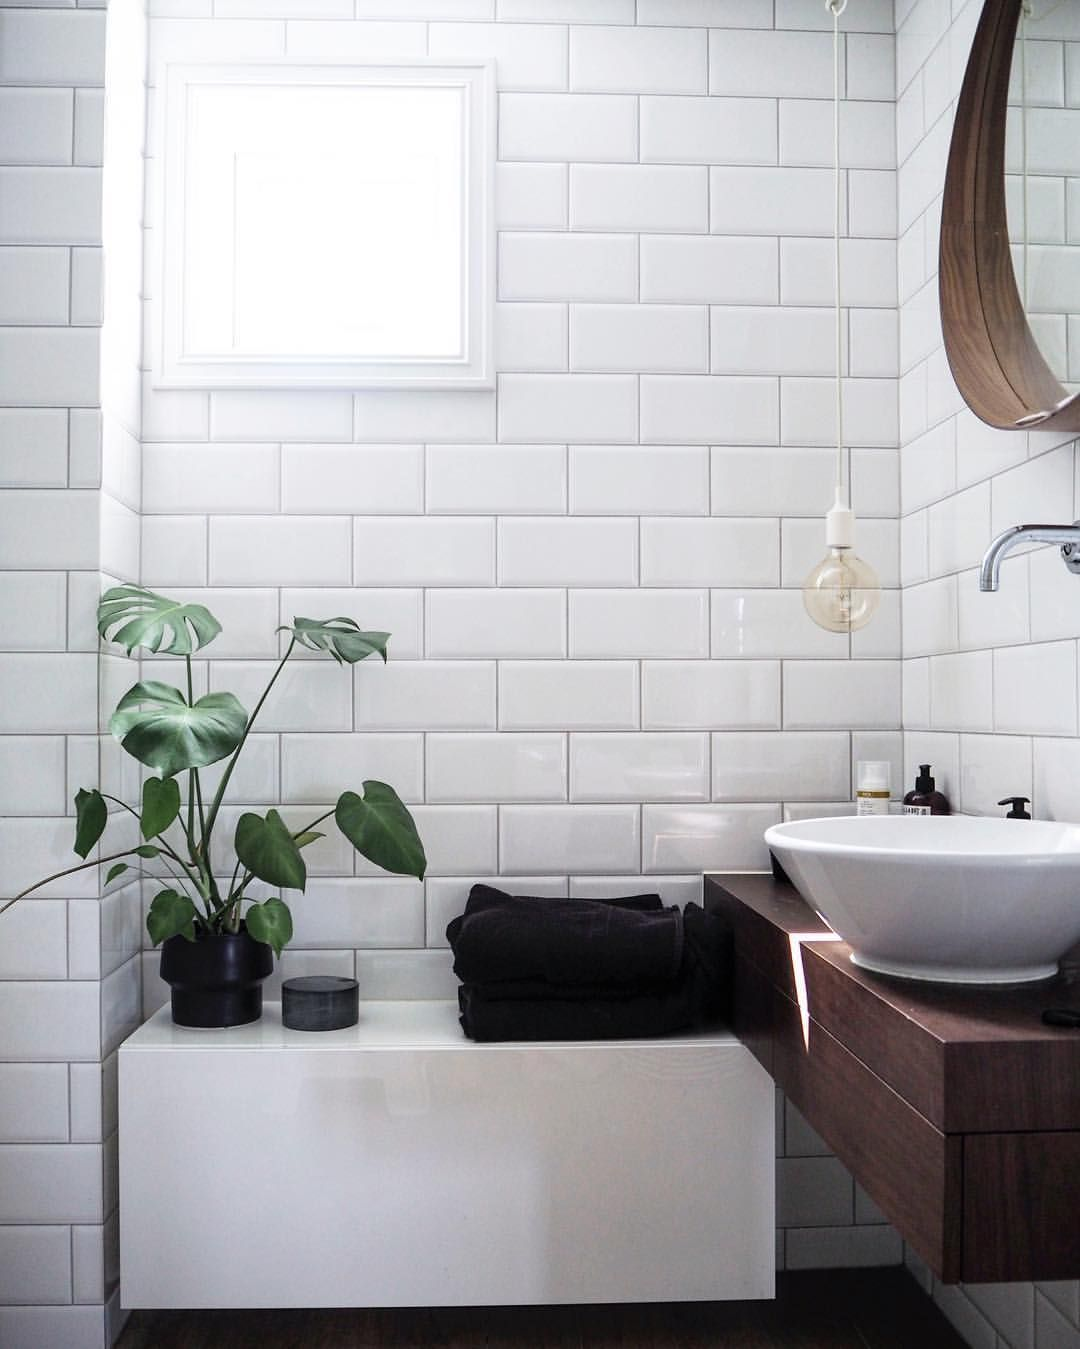 Buy Bathroom Tiles: Bathroom Inspiration. Minimalism, Subway Tiles, Timeless